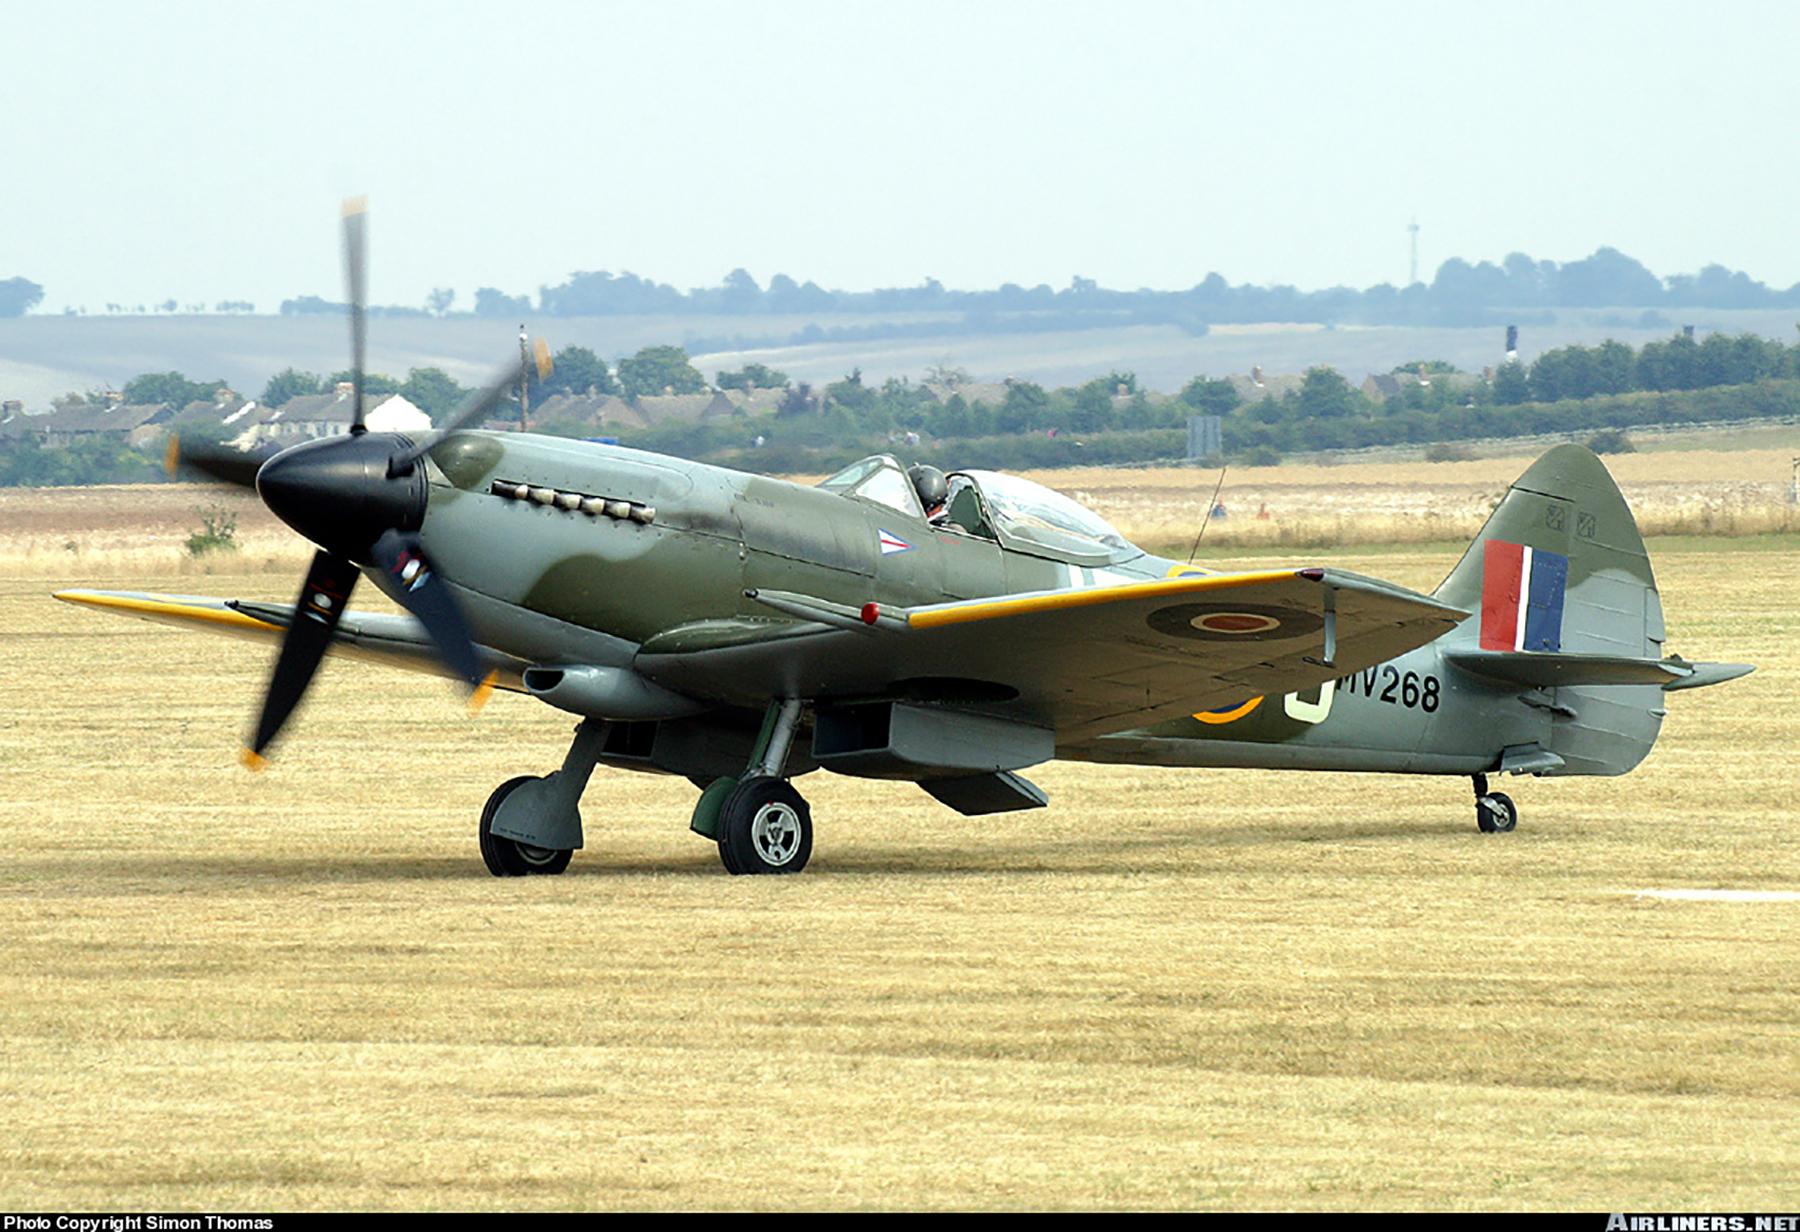 Airworthy Spitfire warbird RAF 91Sqn JEJ MV268 02